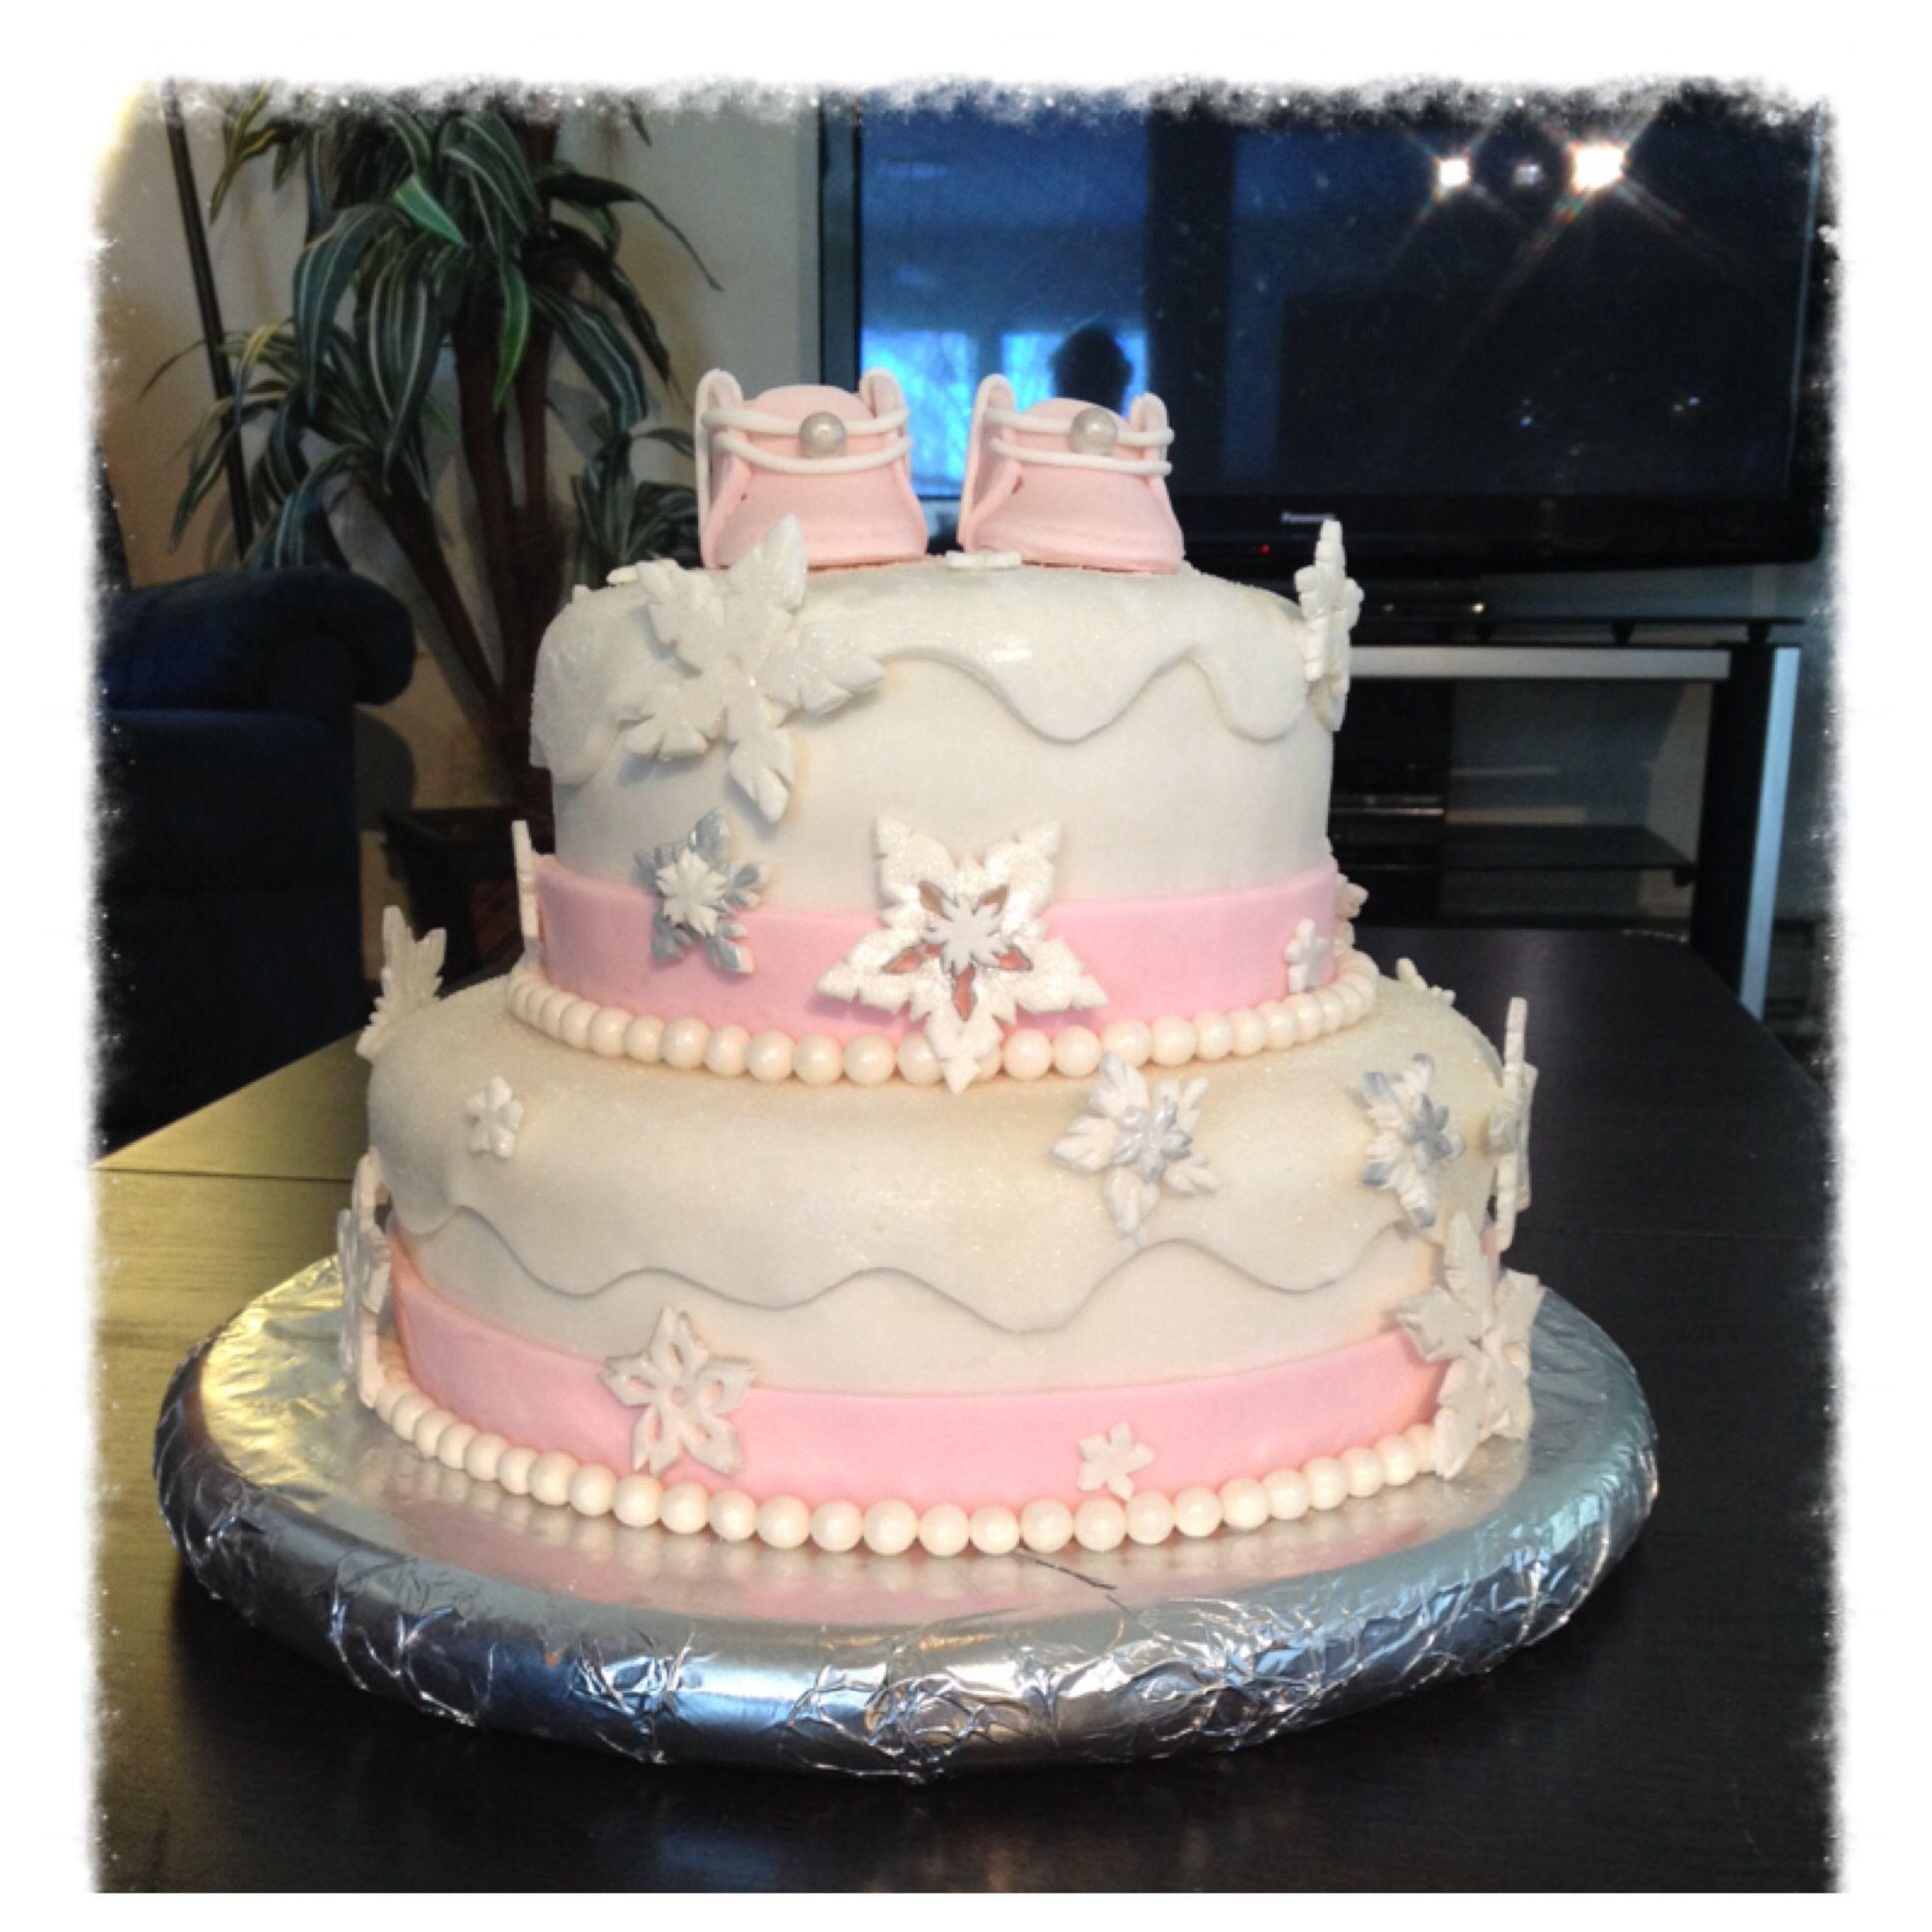 Baby Shower Cake Girls Winter Wonderland Theme With Edible